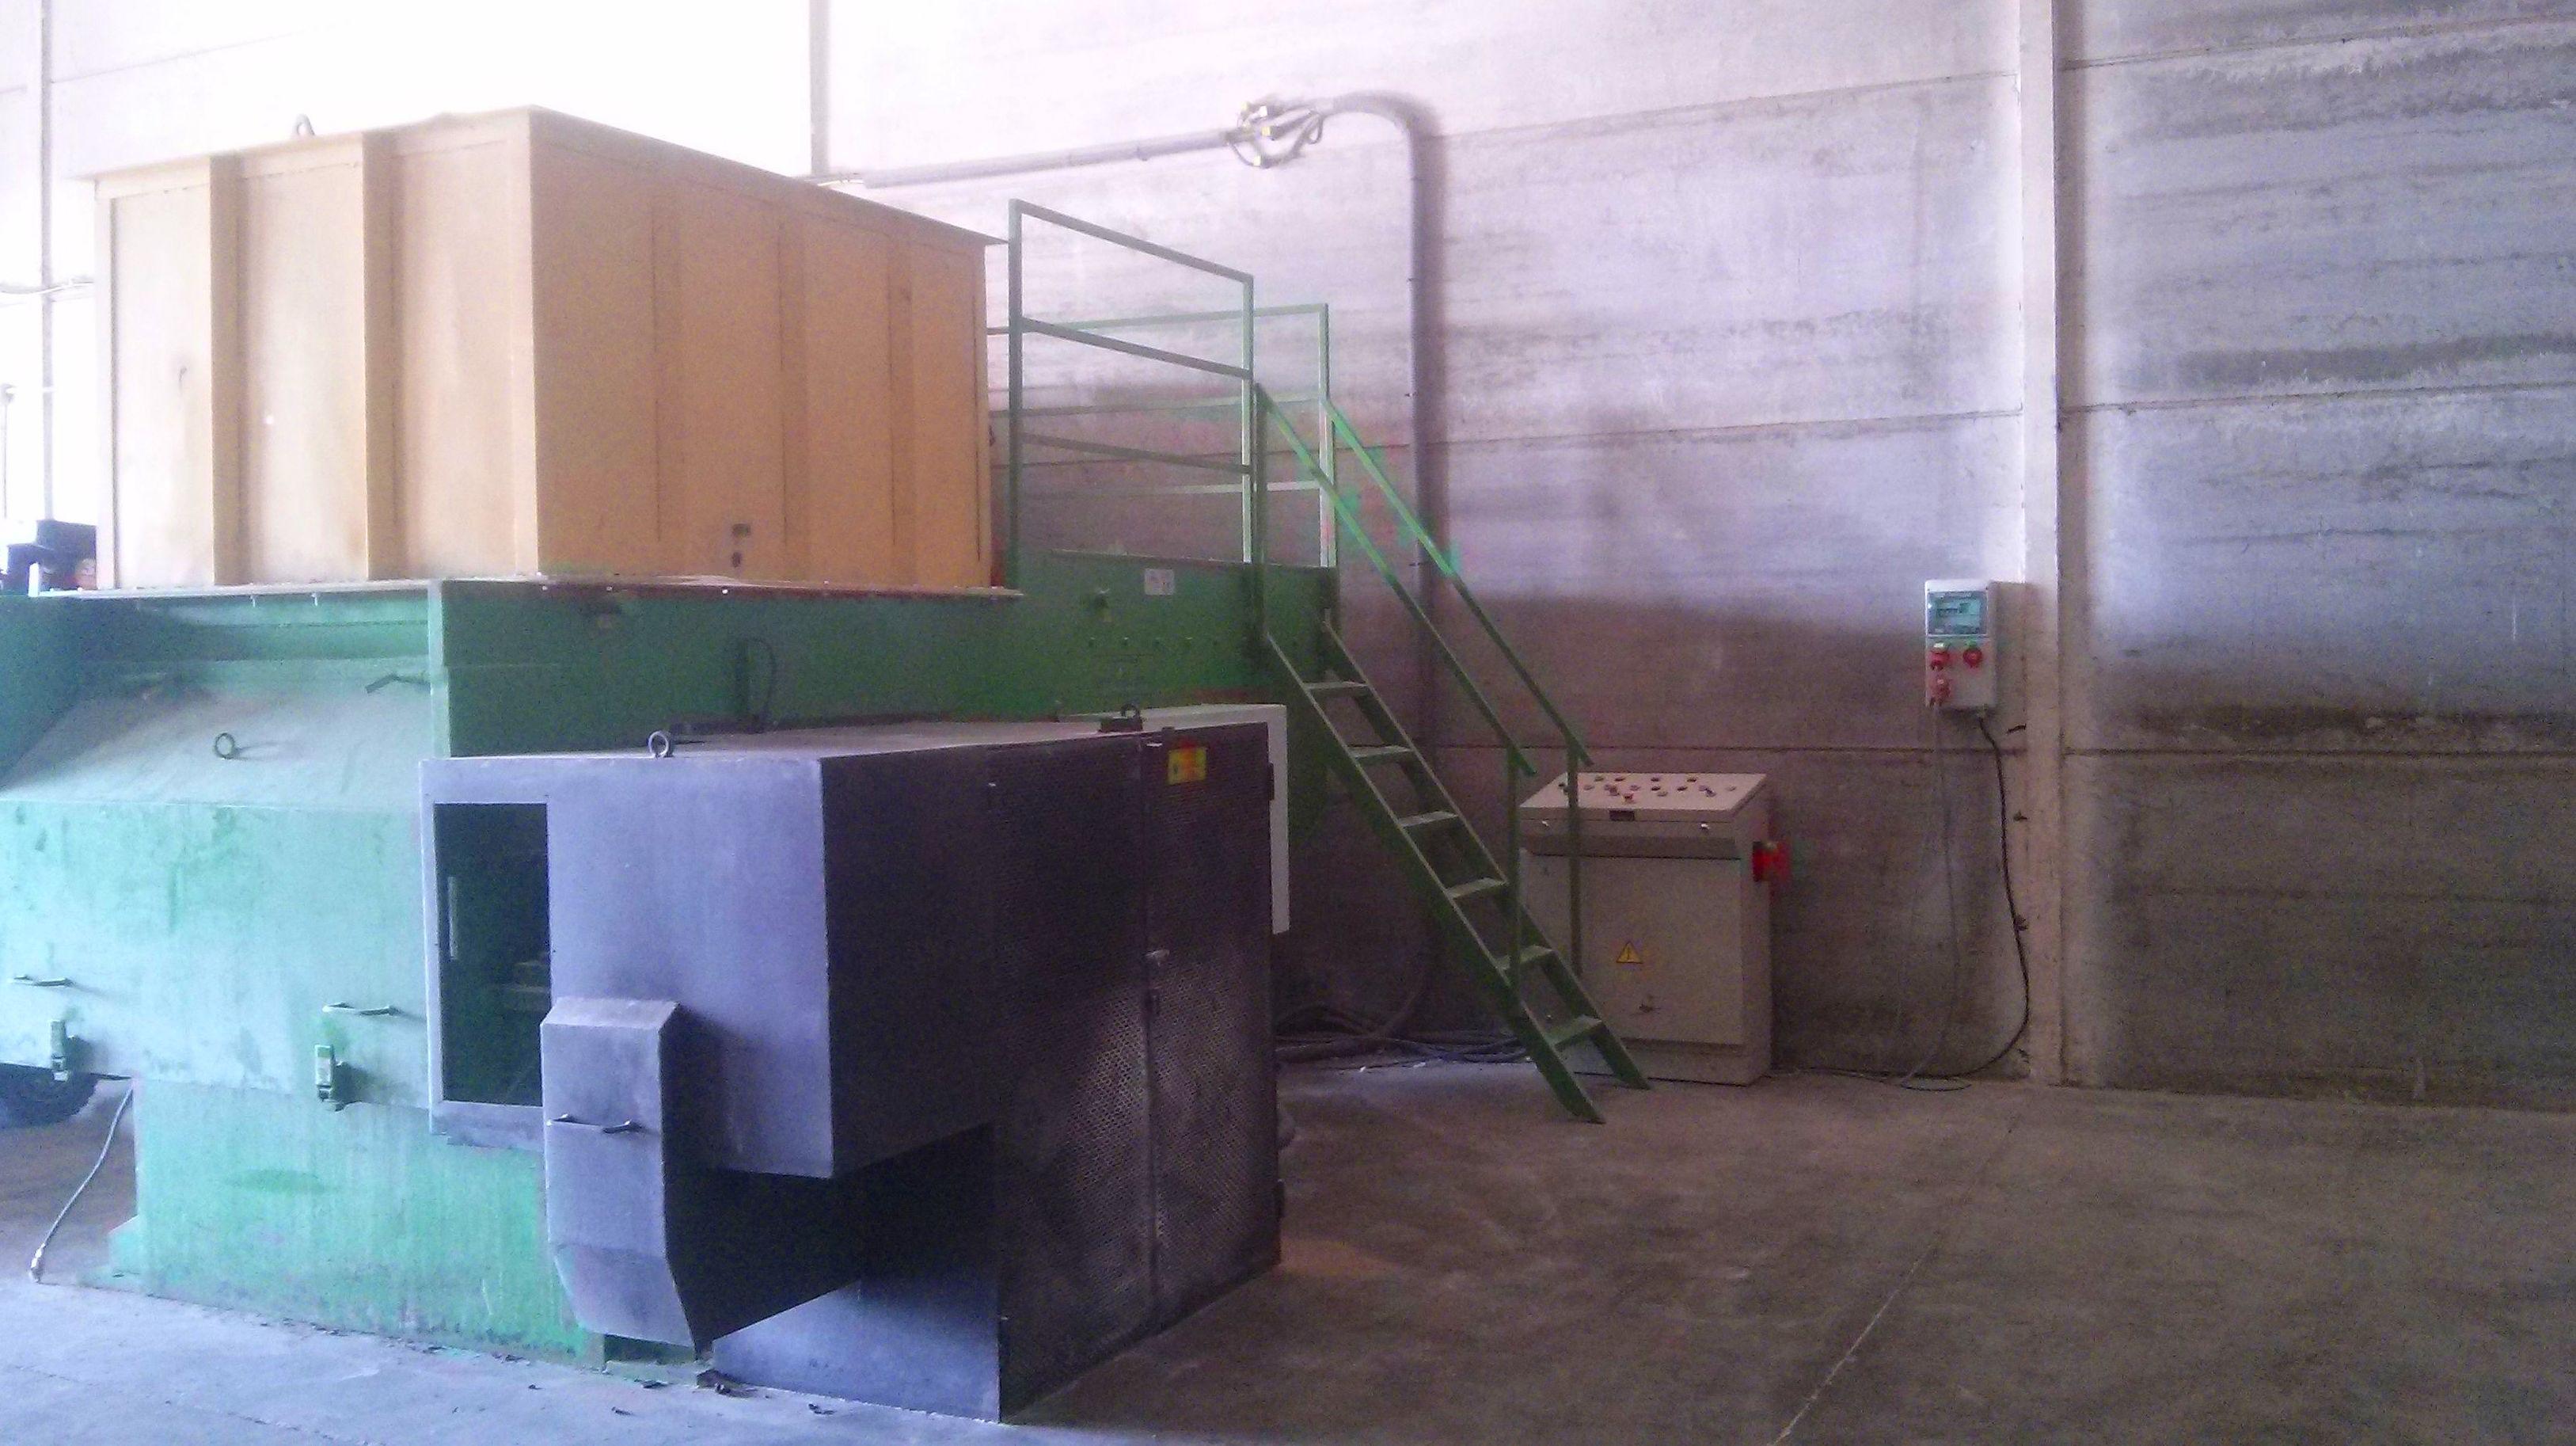 Foto 14 de Reciclaje de residuos en Manises | PalePlast, S. L.